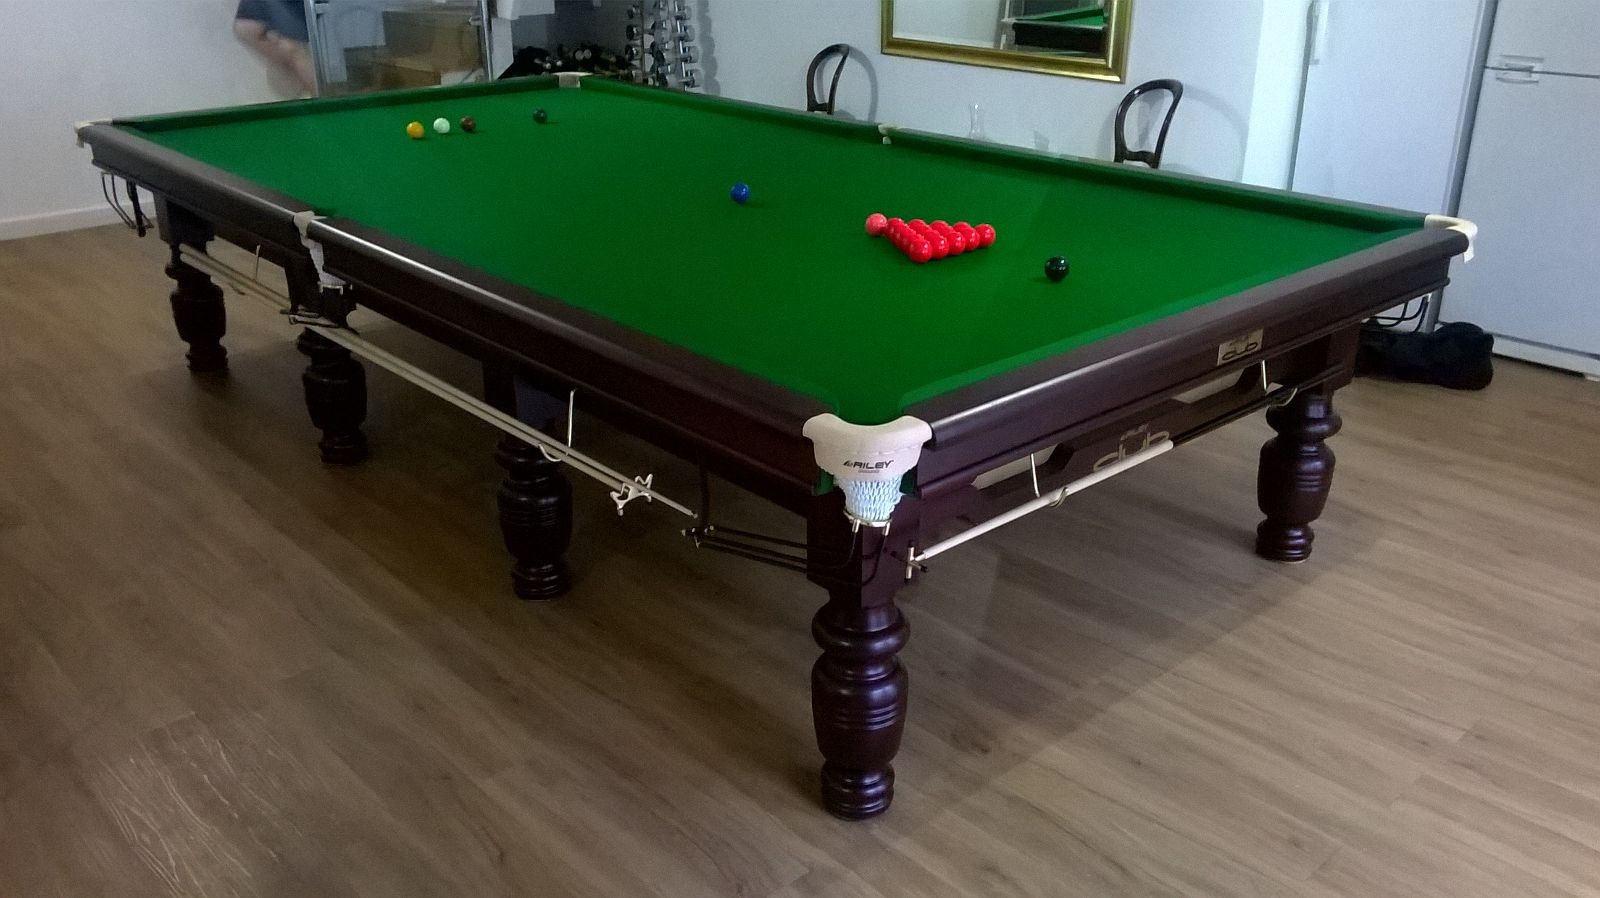 Boobs videos snooker table piss